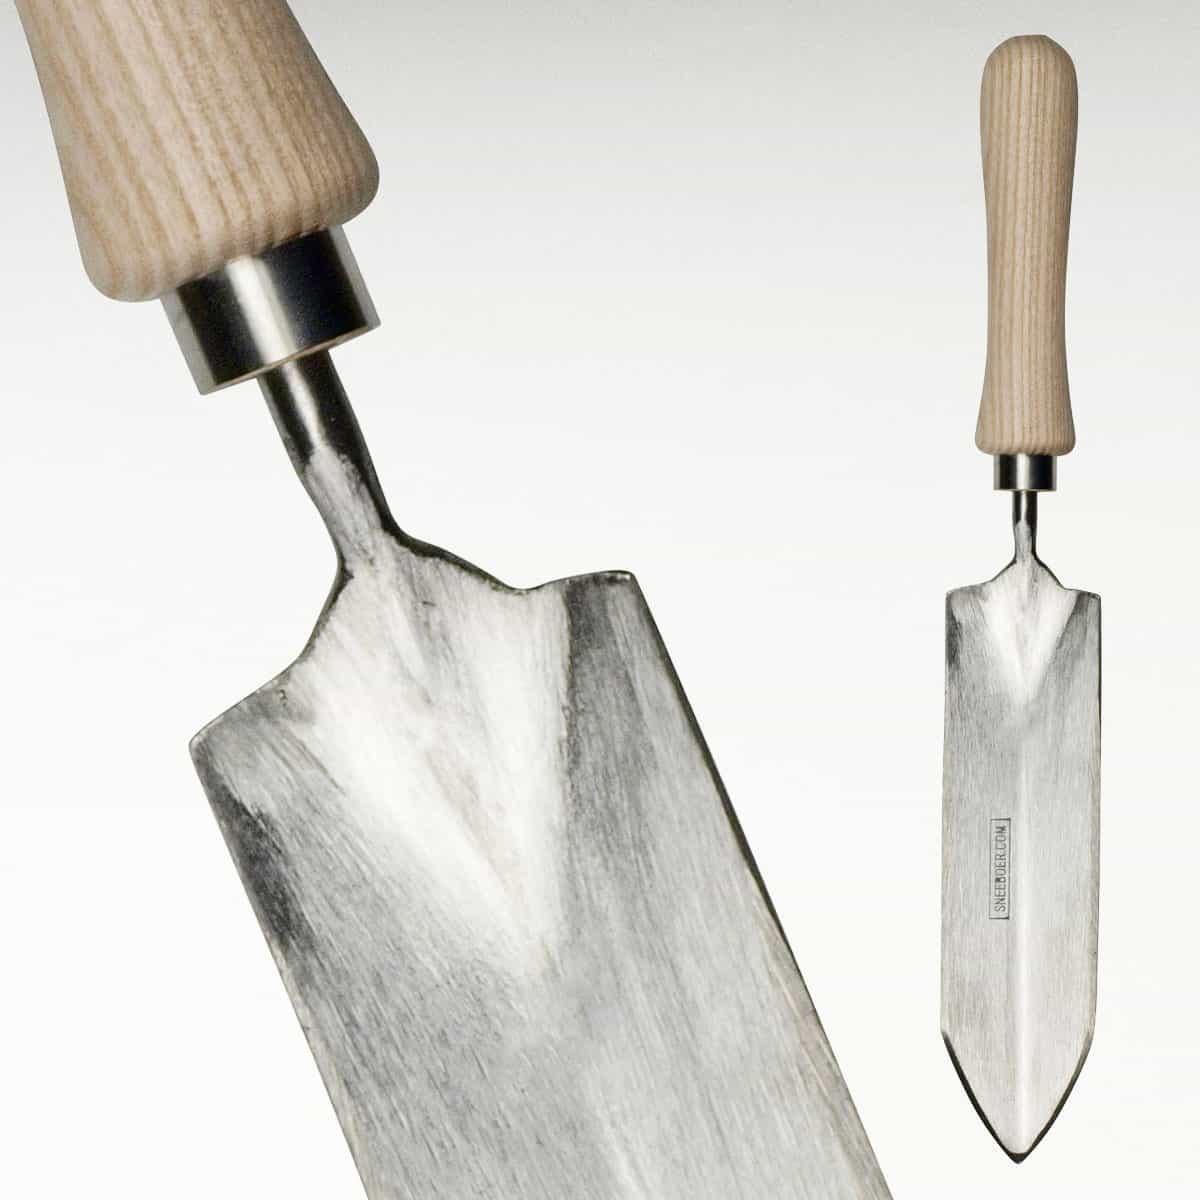 pelle d sherber longue plantain et achill e sneeboer outils une main sneeboer. Black Bedroom Furniture Sets. Home Design Ideas